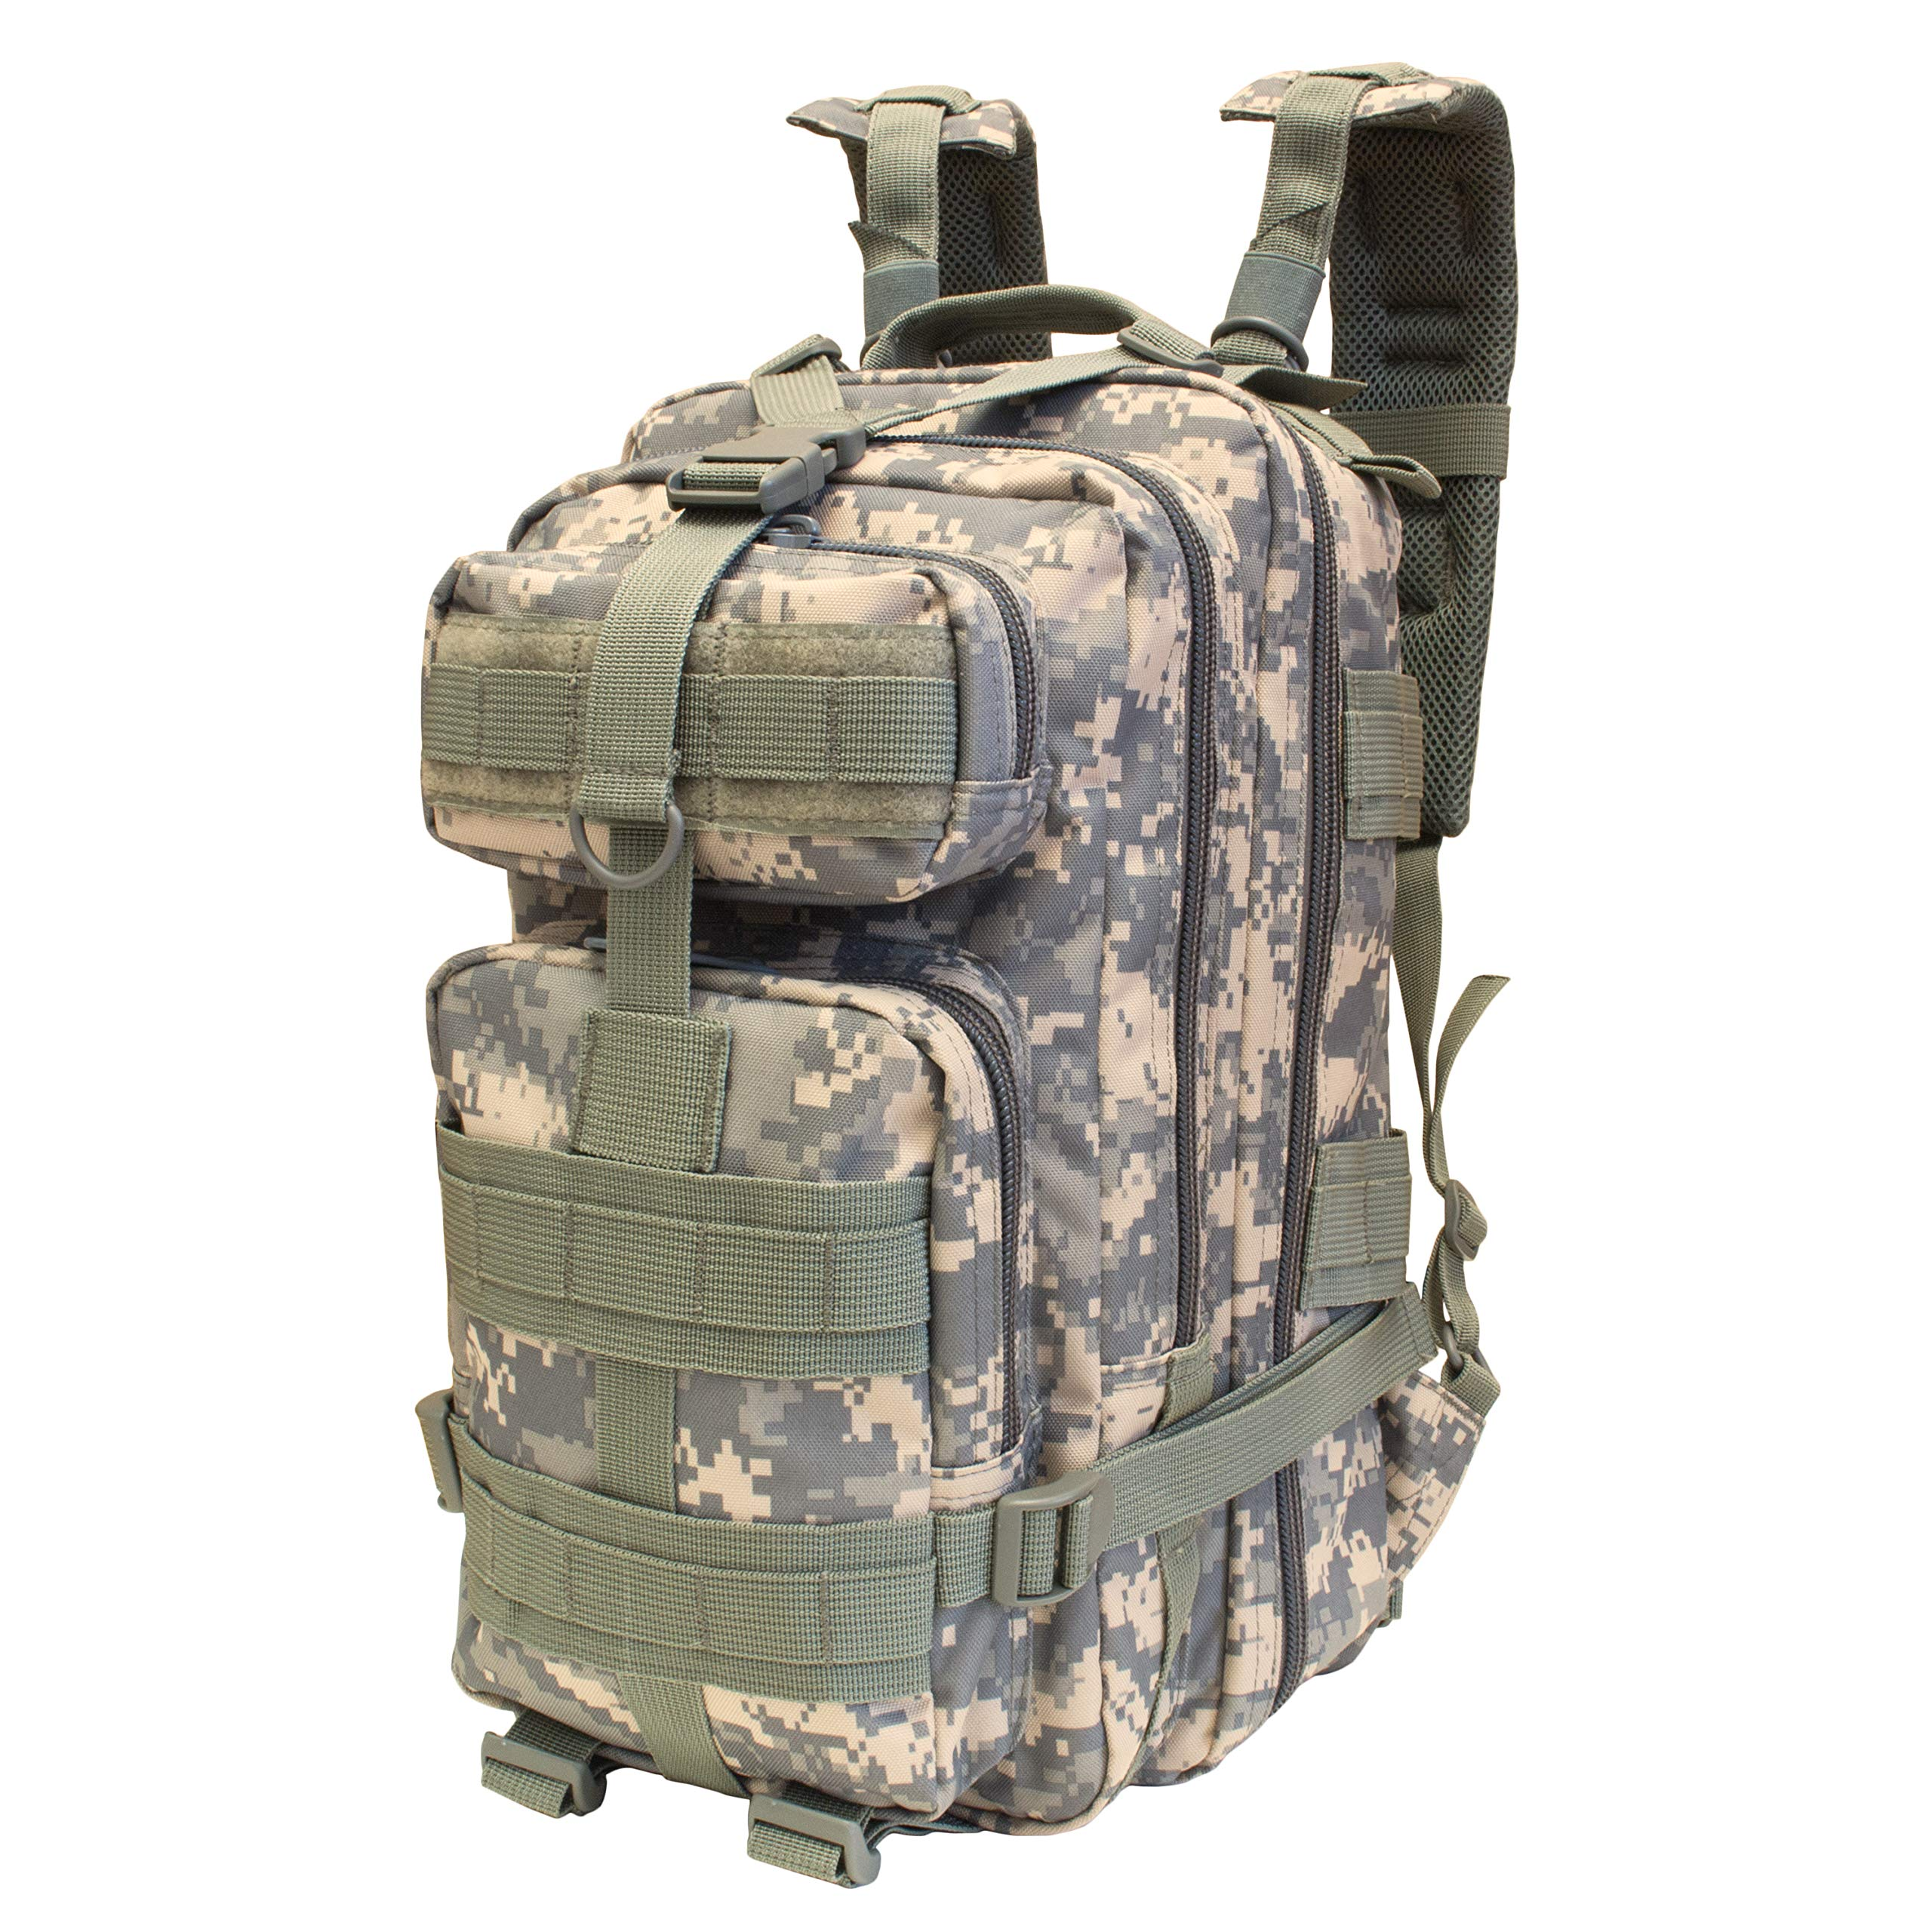 ZaxLand Military Backpack Waterproof Multicam